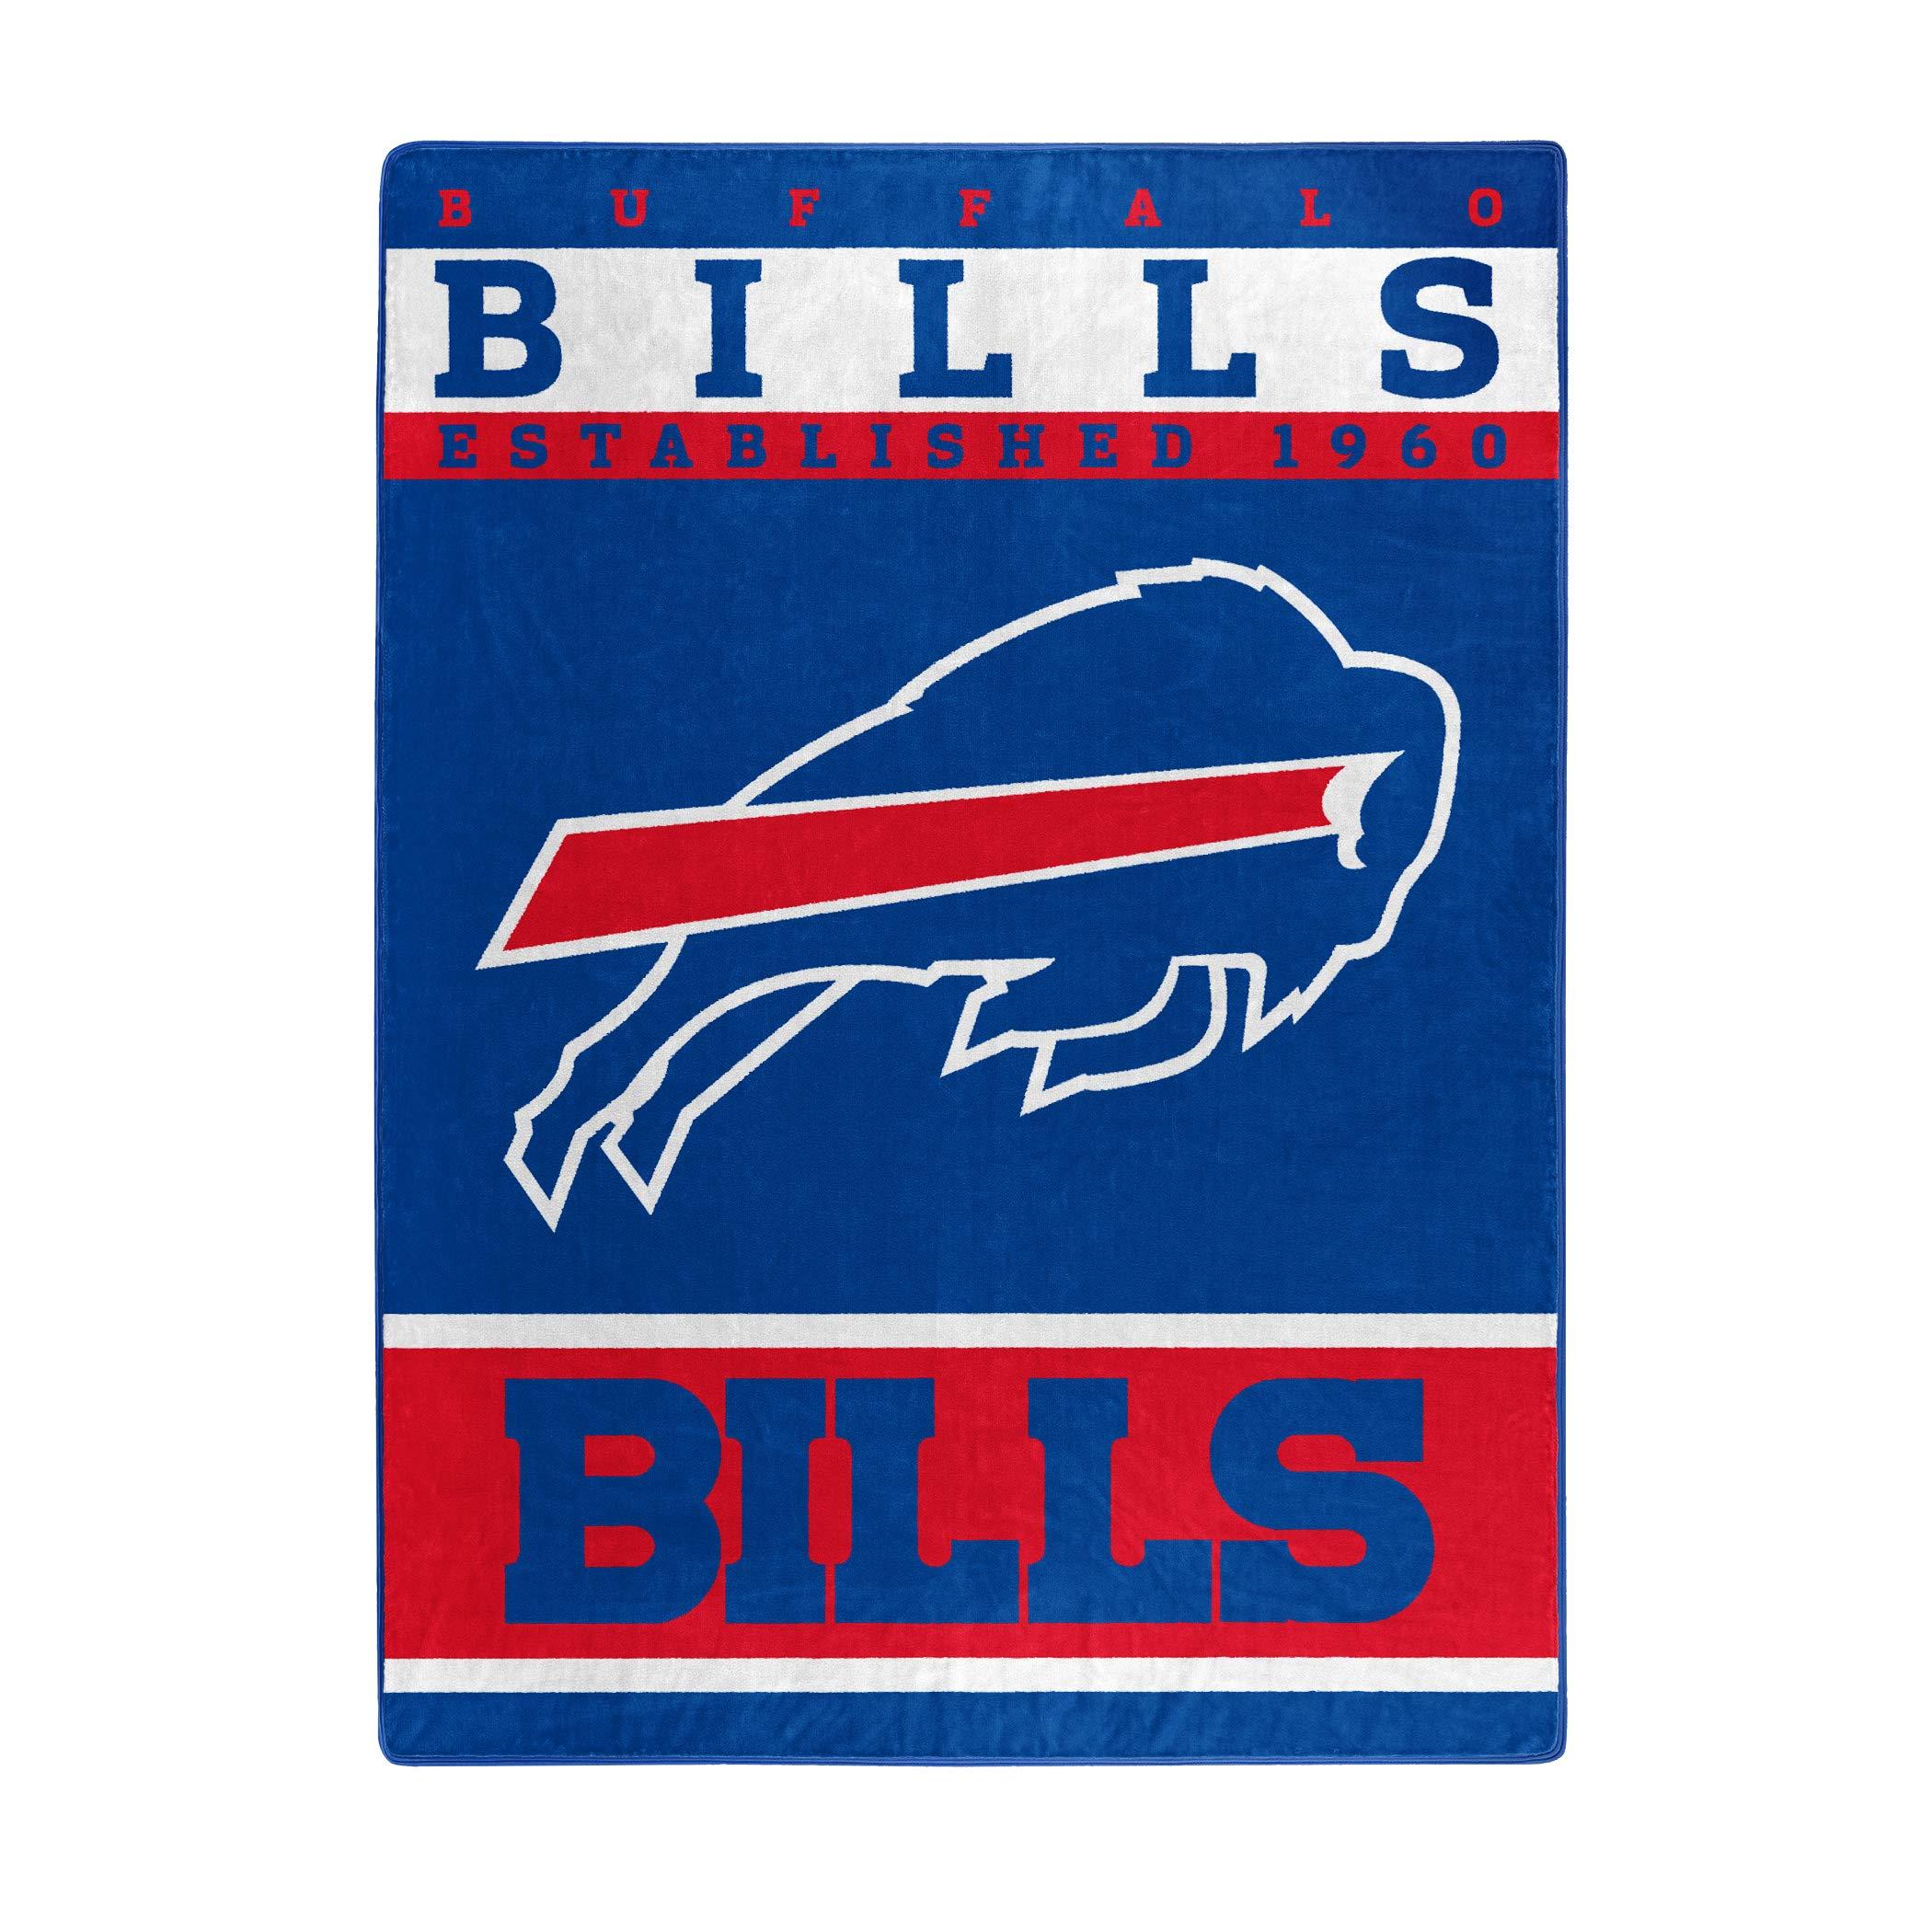 The Northwest Company Officially Licensed NFL Buffalo Bills 12th Man Plush Raschel Throw Blanket, 60'' x 80''